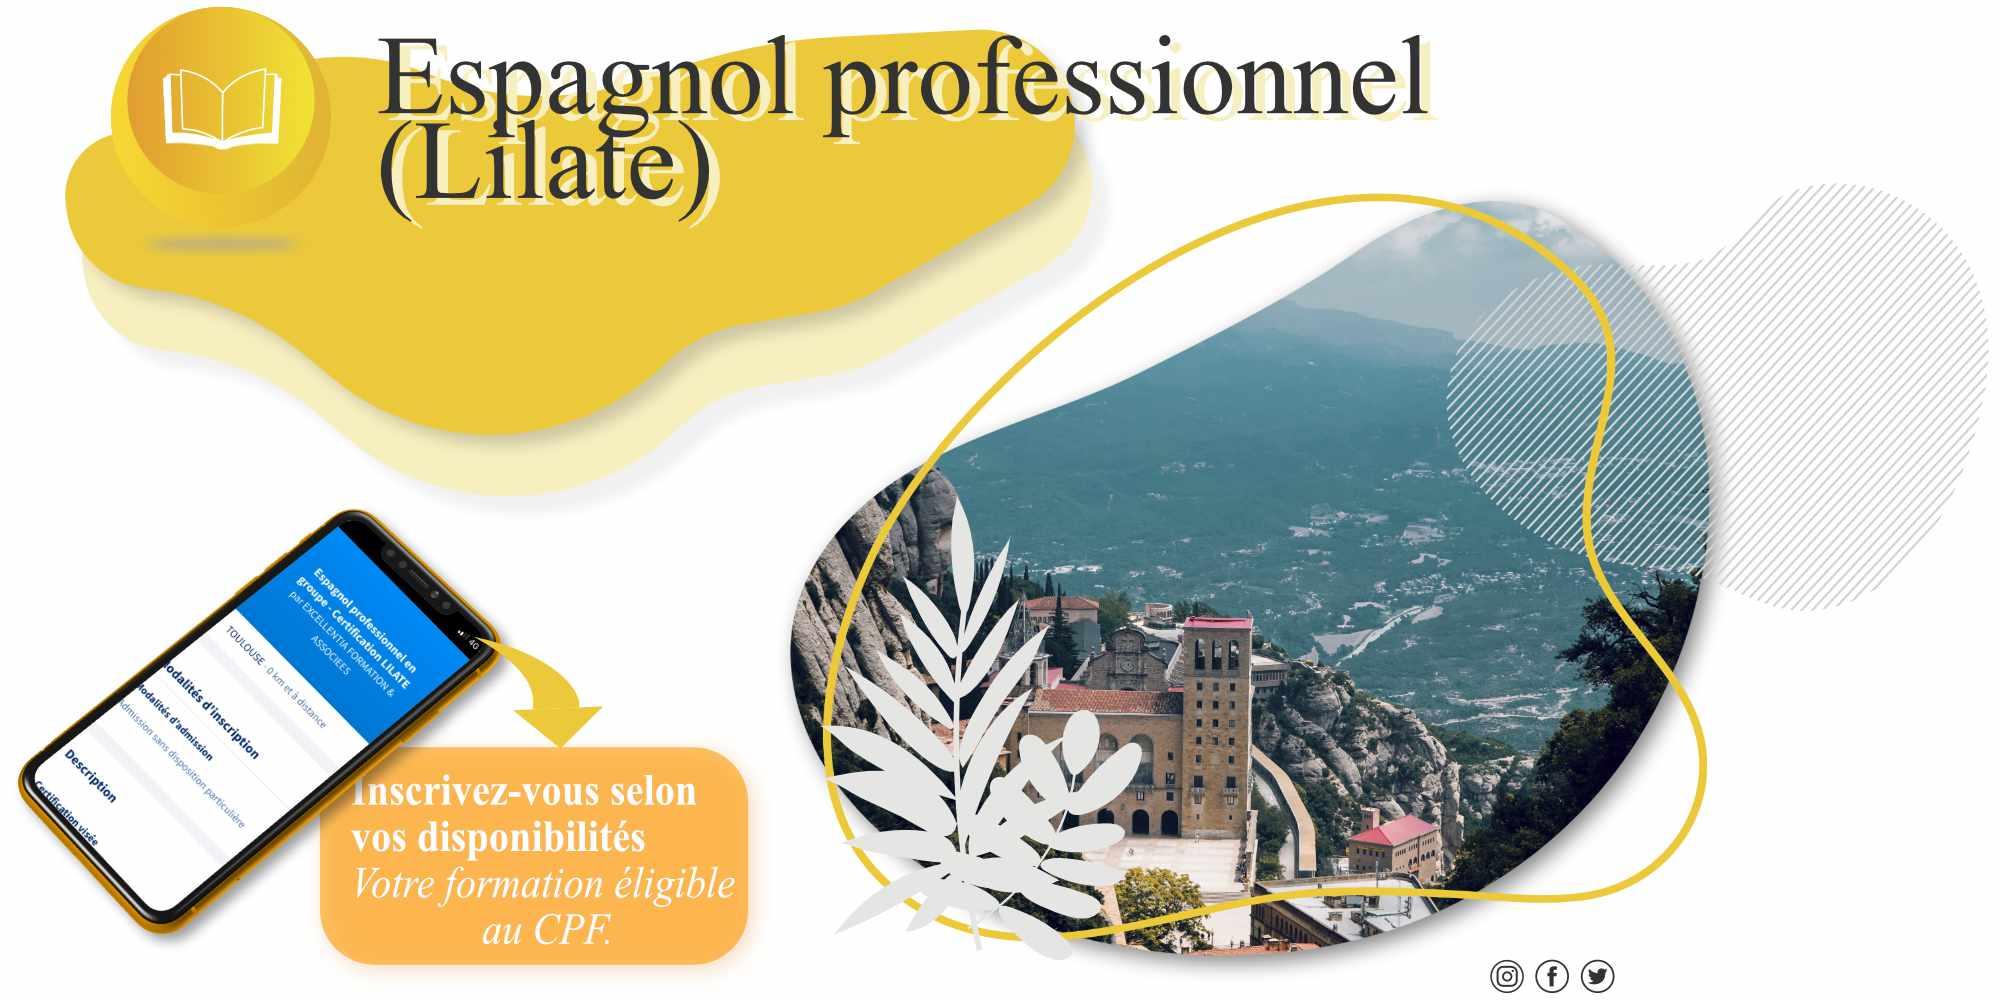 Espagnol_professionnel_Lilate_.jpg